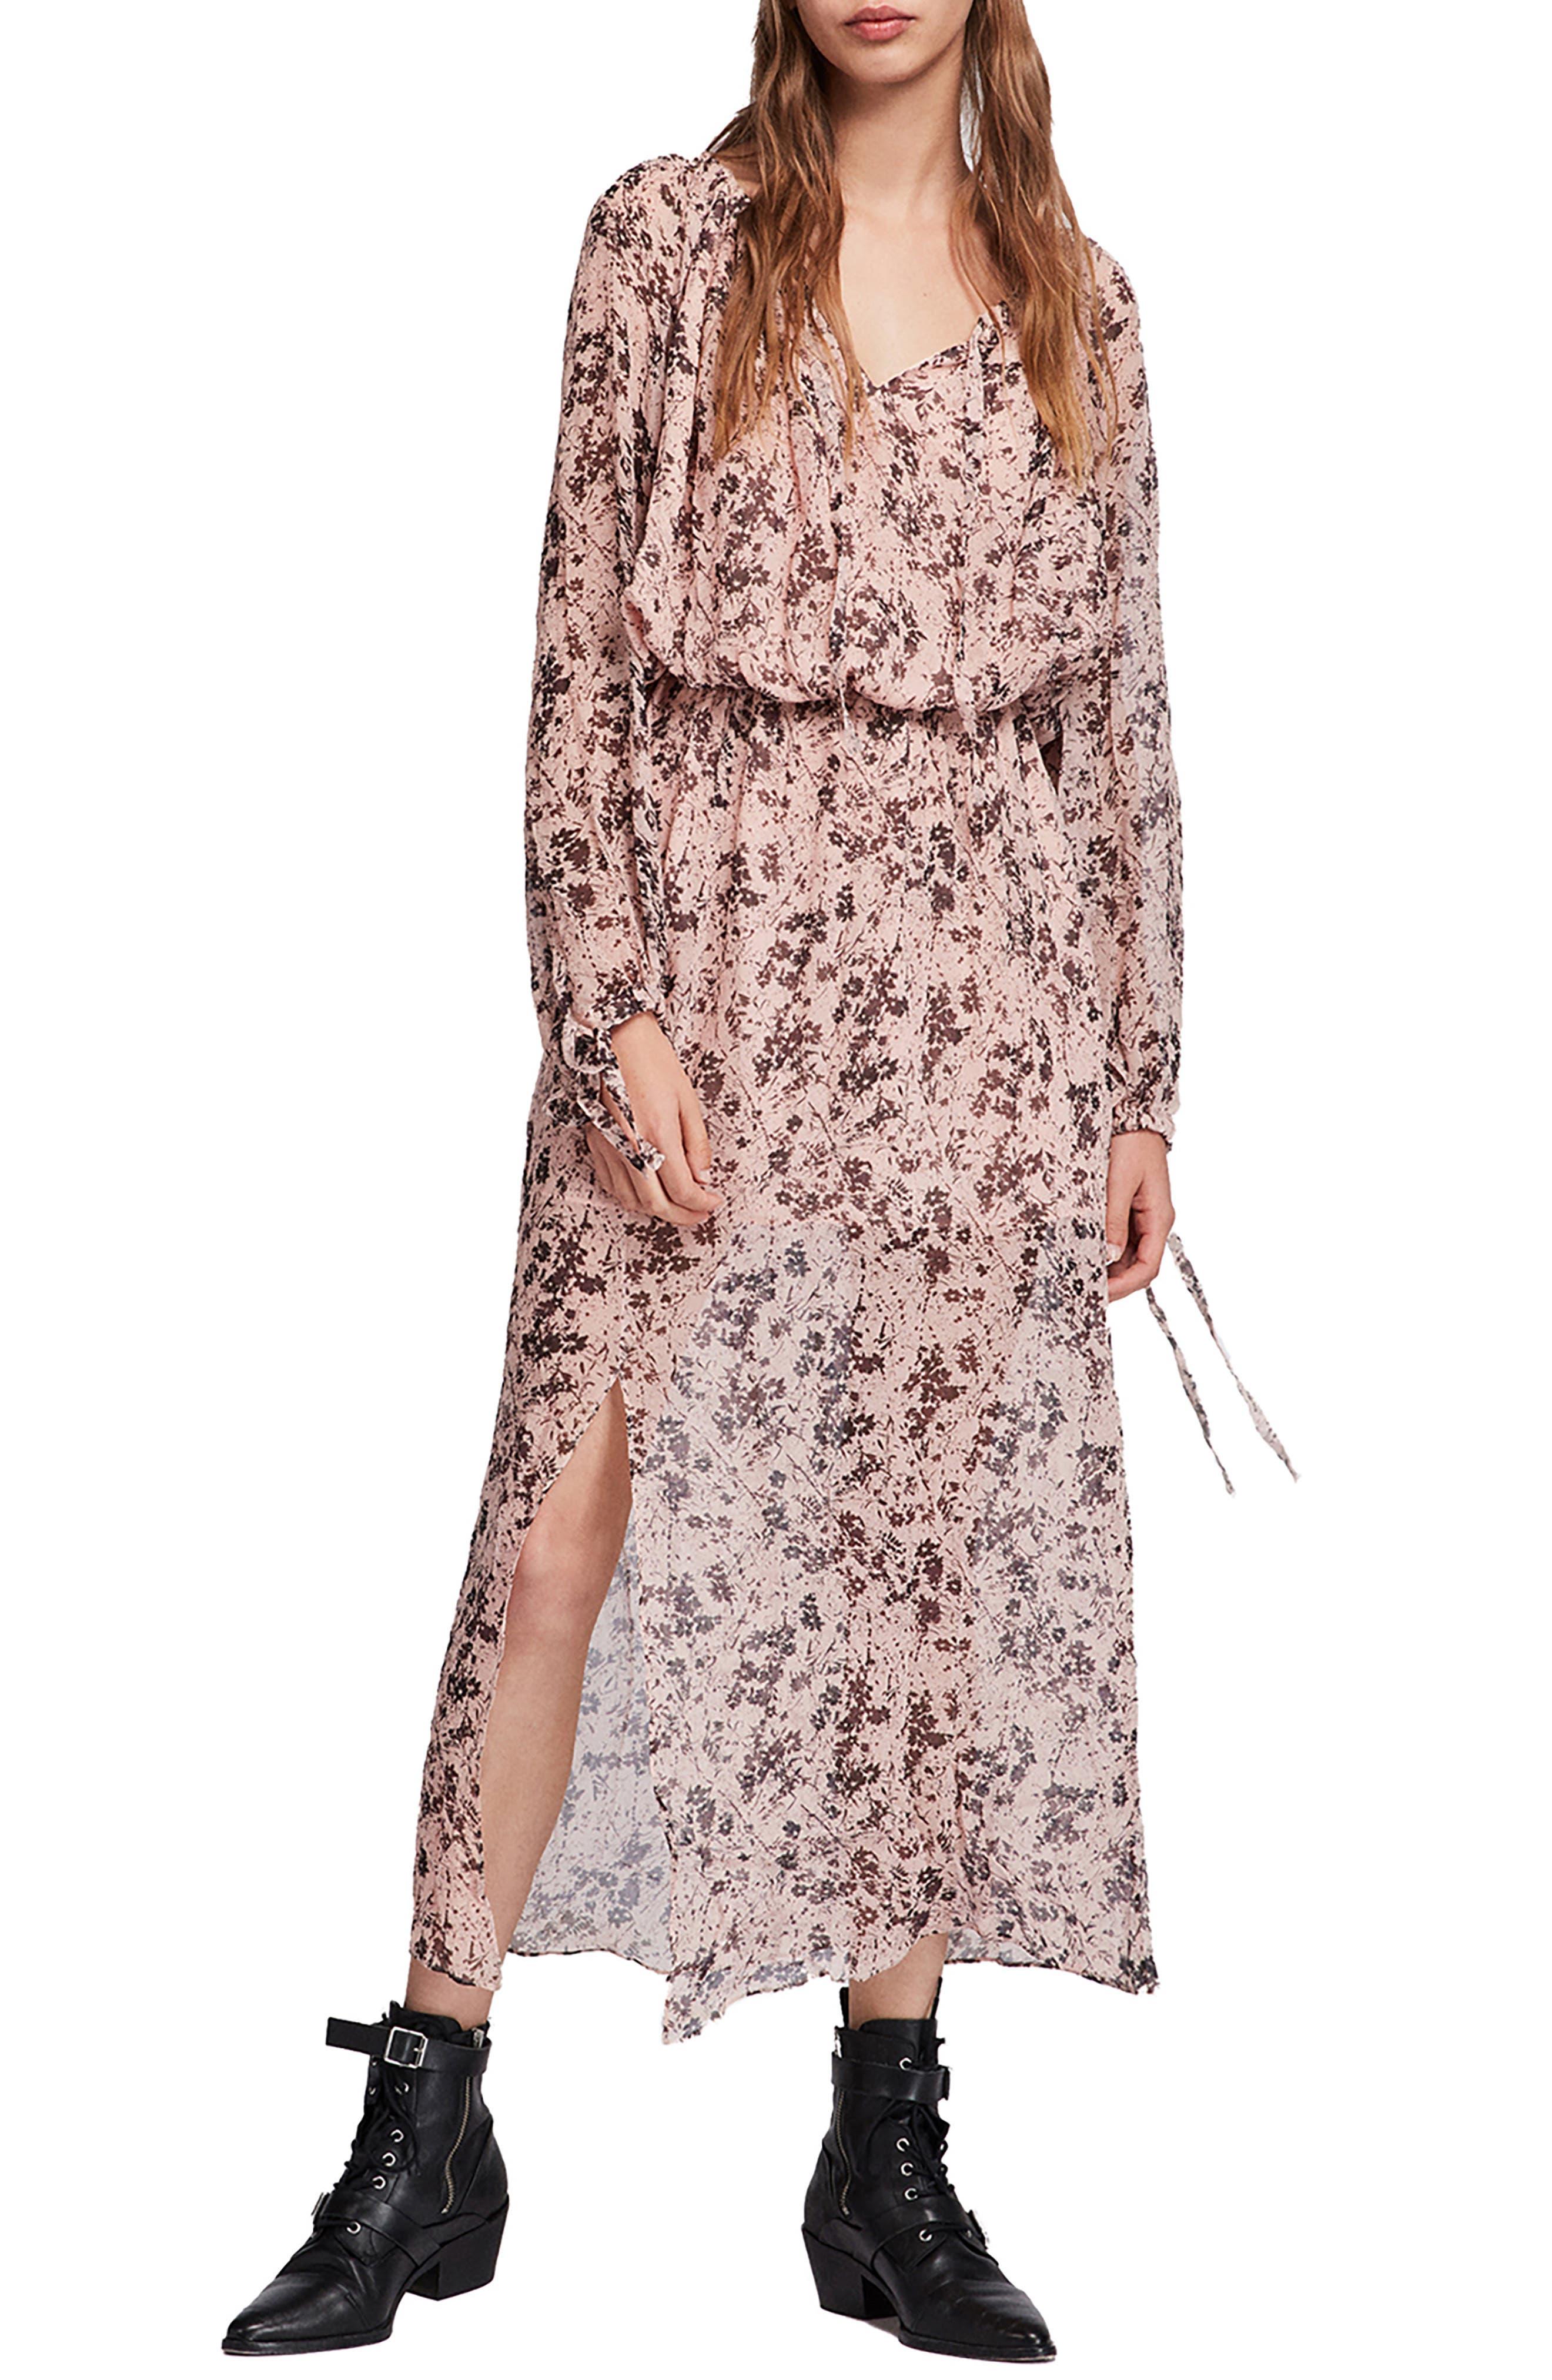 ALLSAINTS Chesca Petal Long Dress in Pink